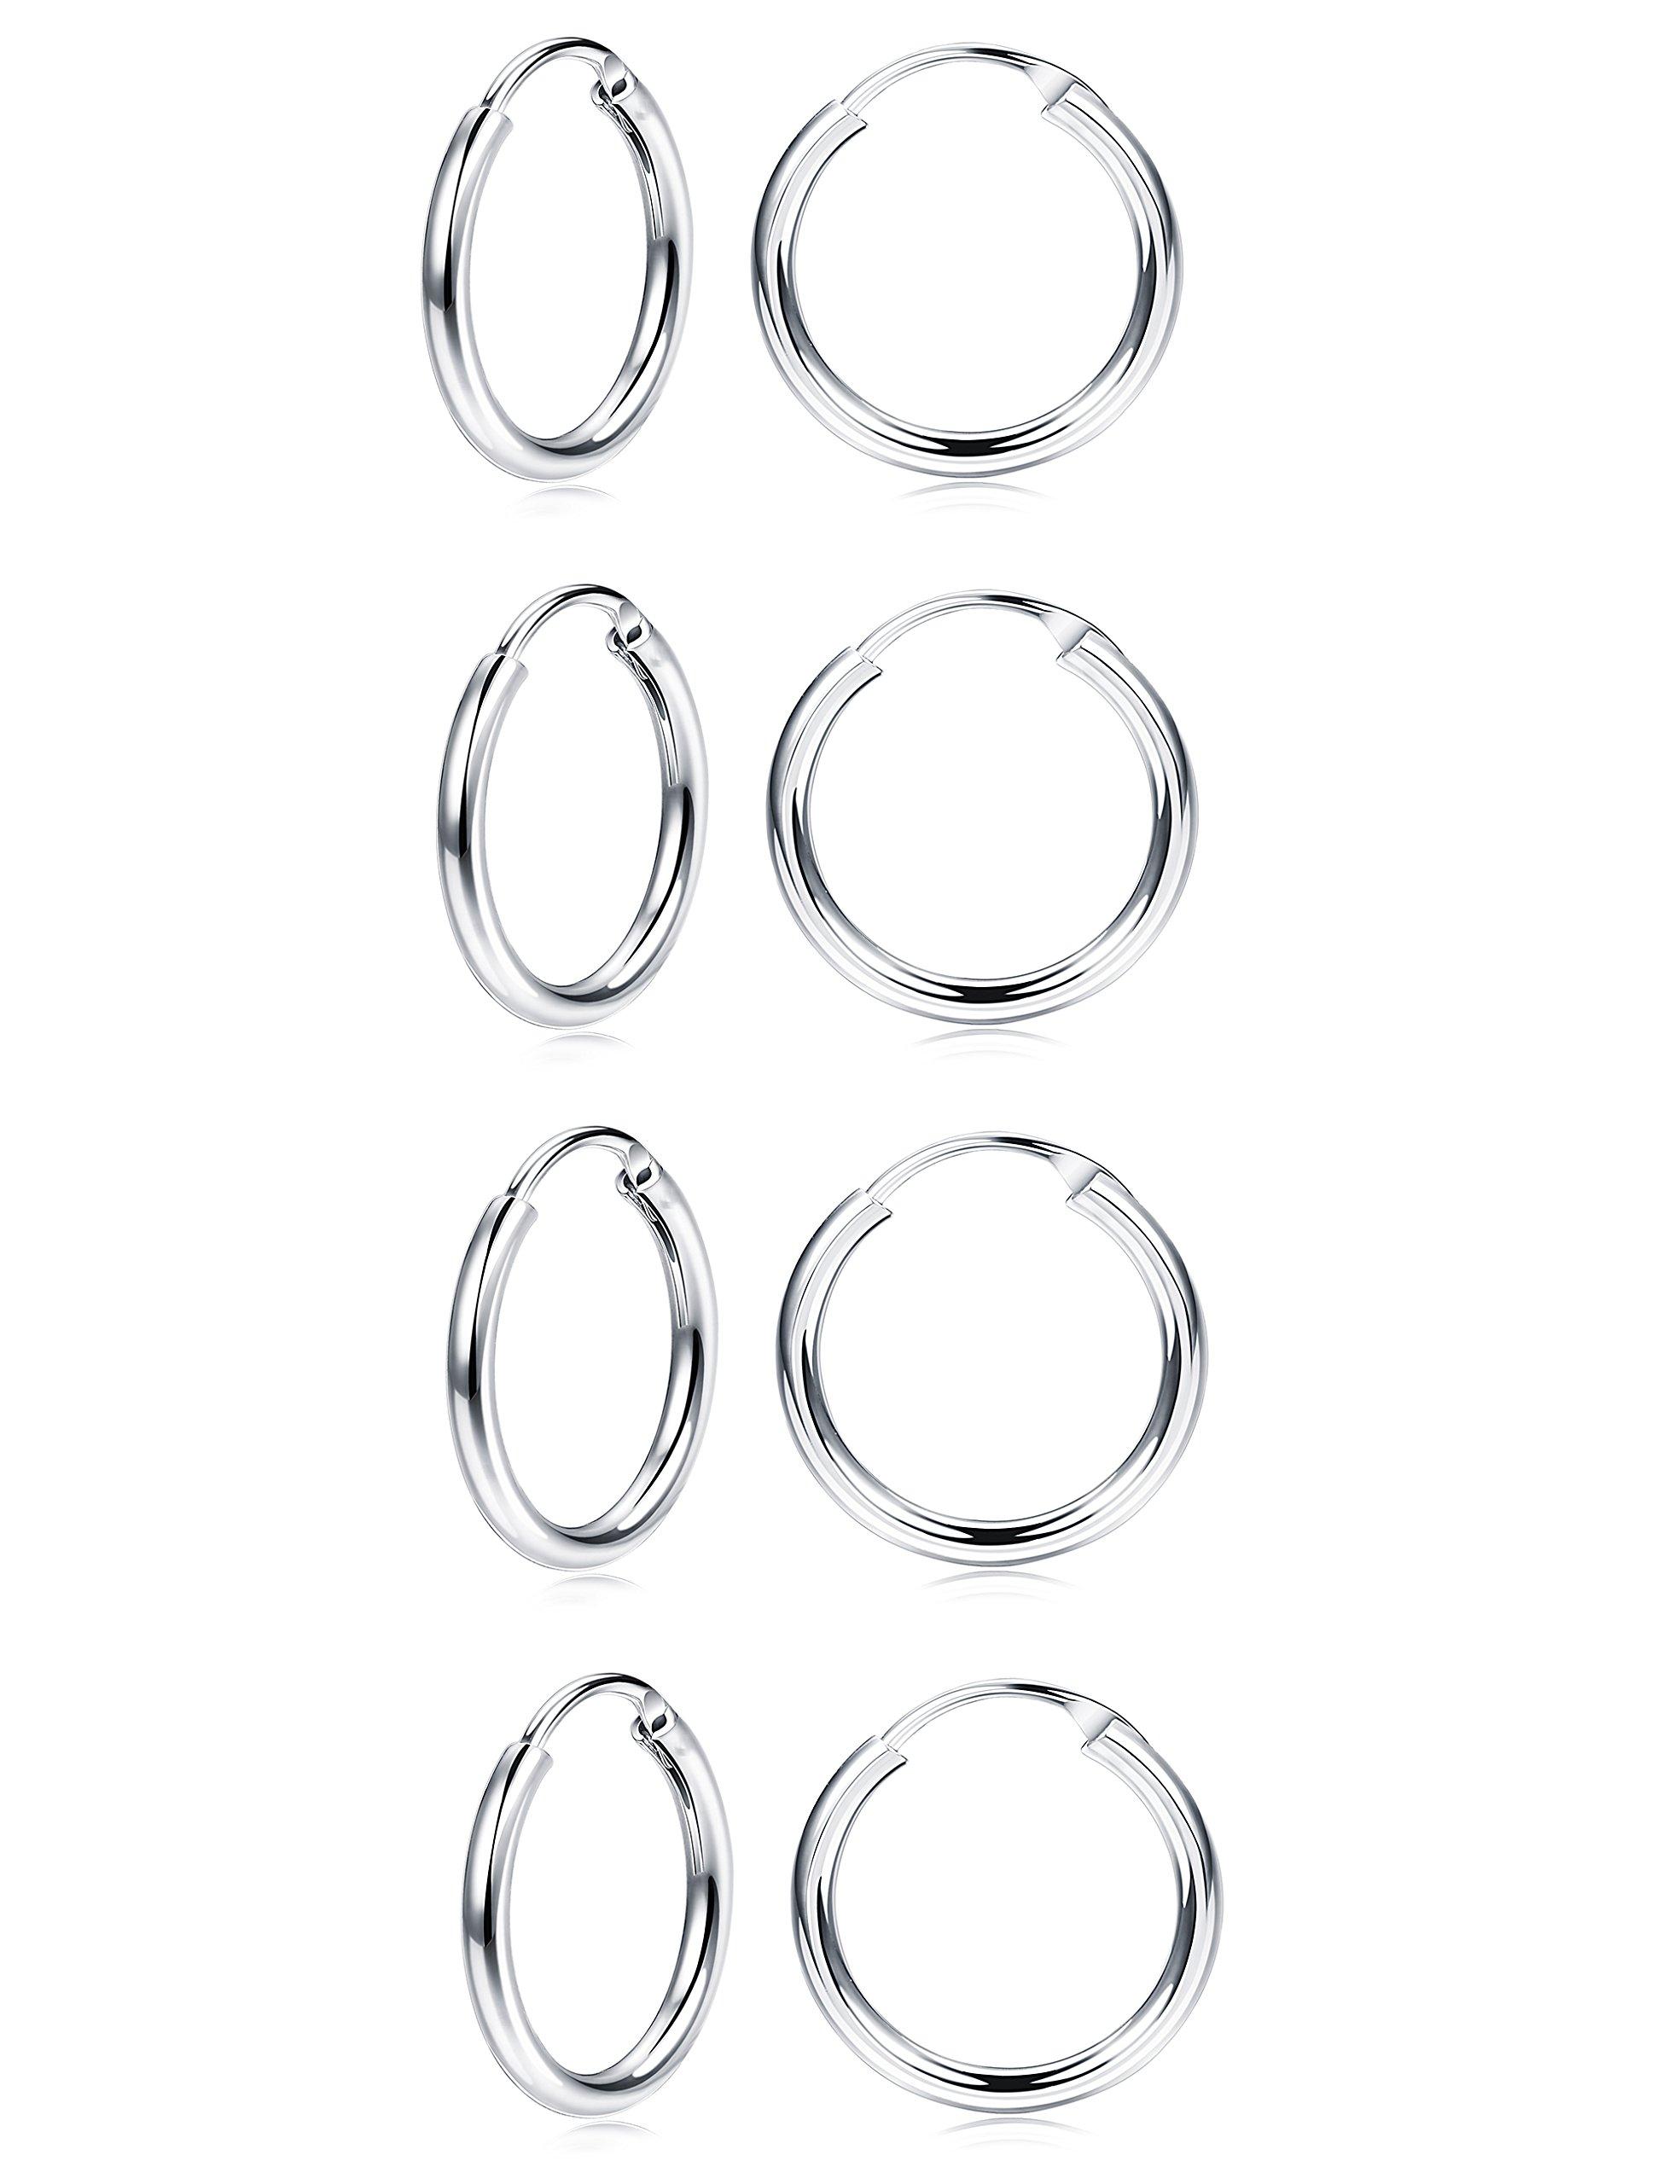 FUNRUN JEWELRY 4 Pairs 10MM Sterling Silver Small Hoop Earrings for Women Men Endless Round Unisex Earrings Set